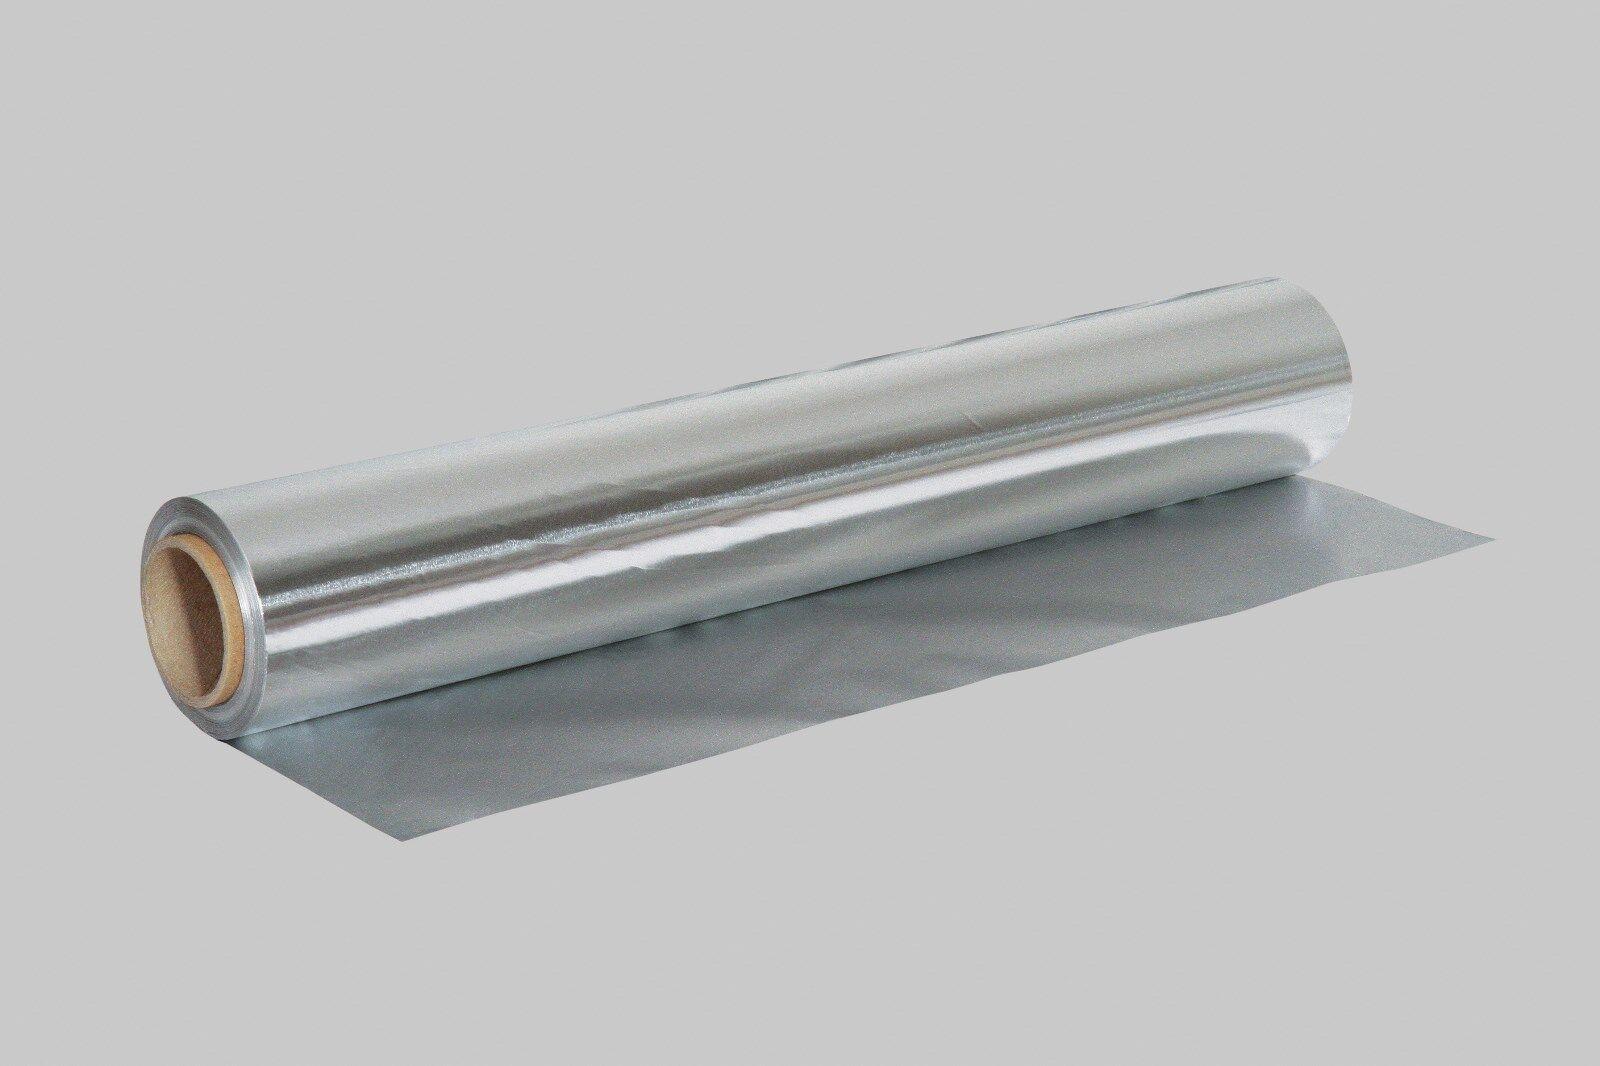 Aluminiumfolie echte 50 my x 1.000 mm x 25 m Dampfsperre Alfol ® 50 25